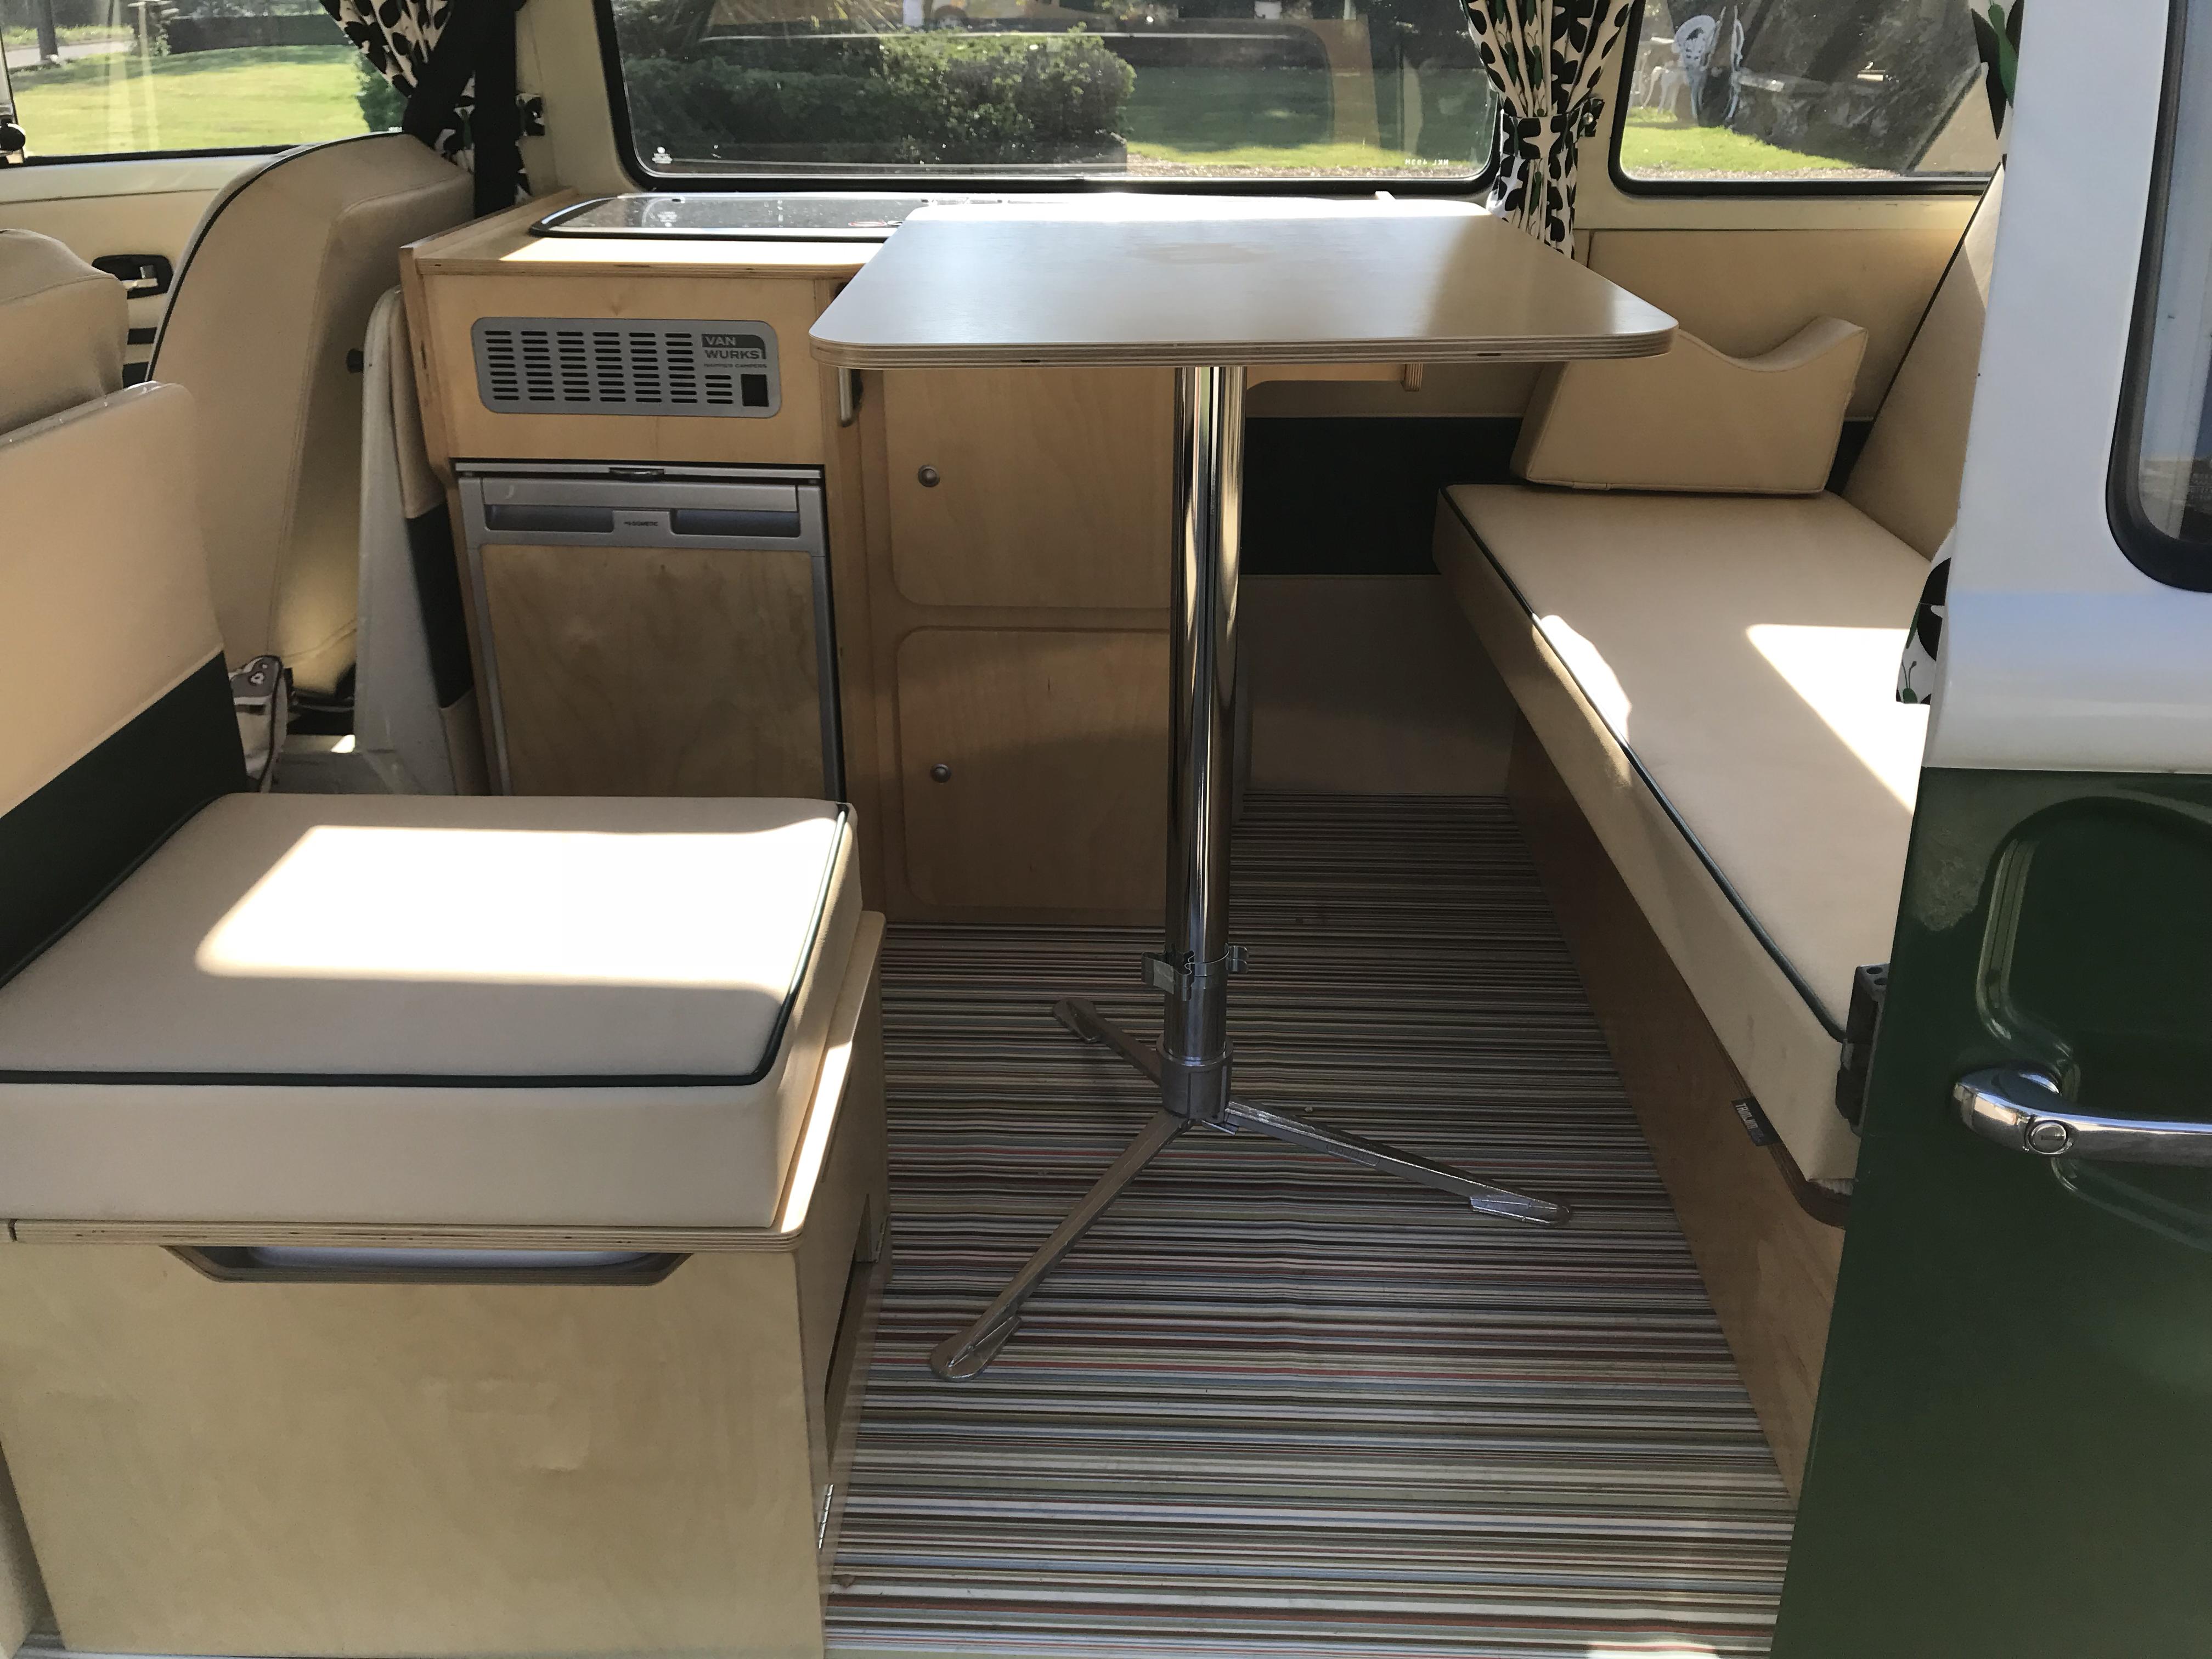 For-sale-1973-vw-camper-van